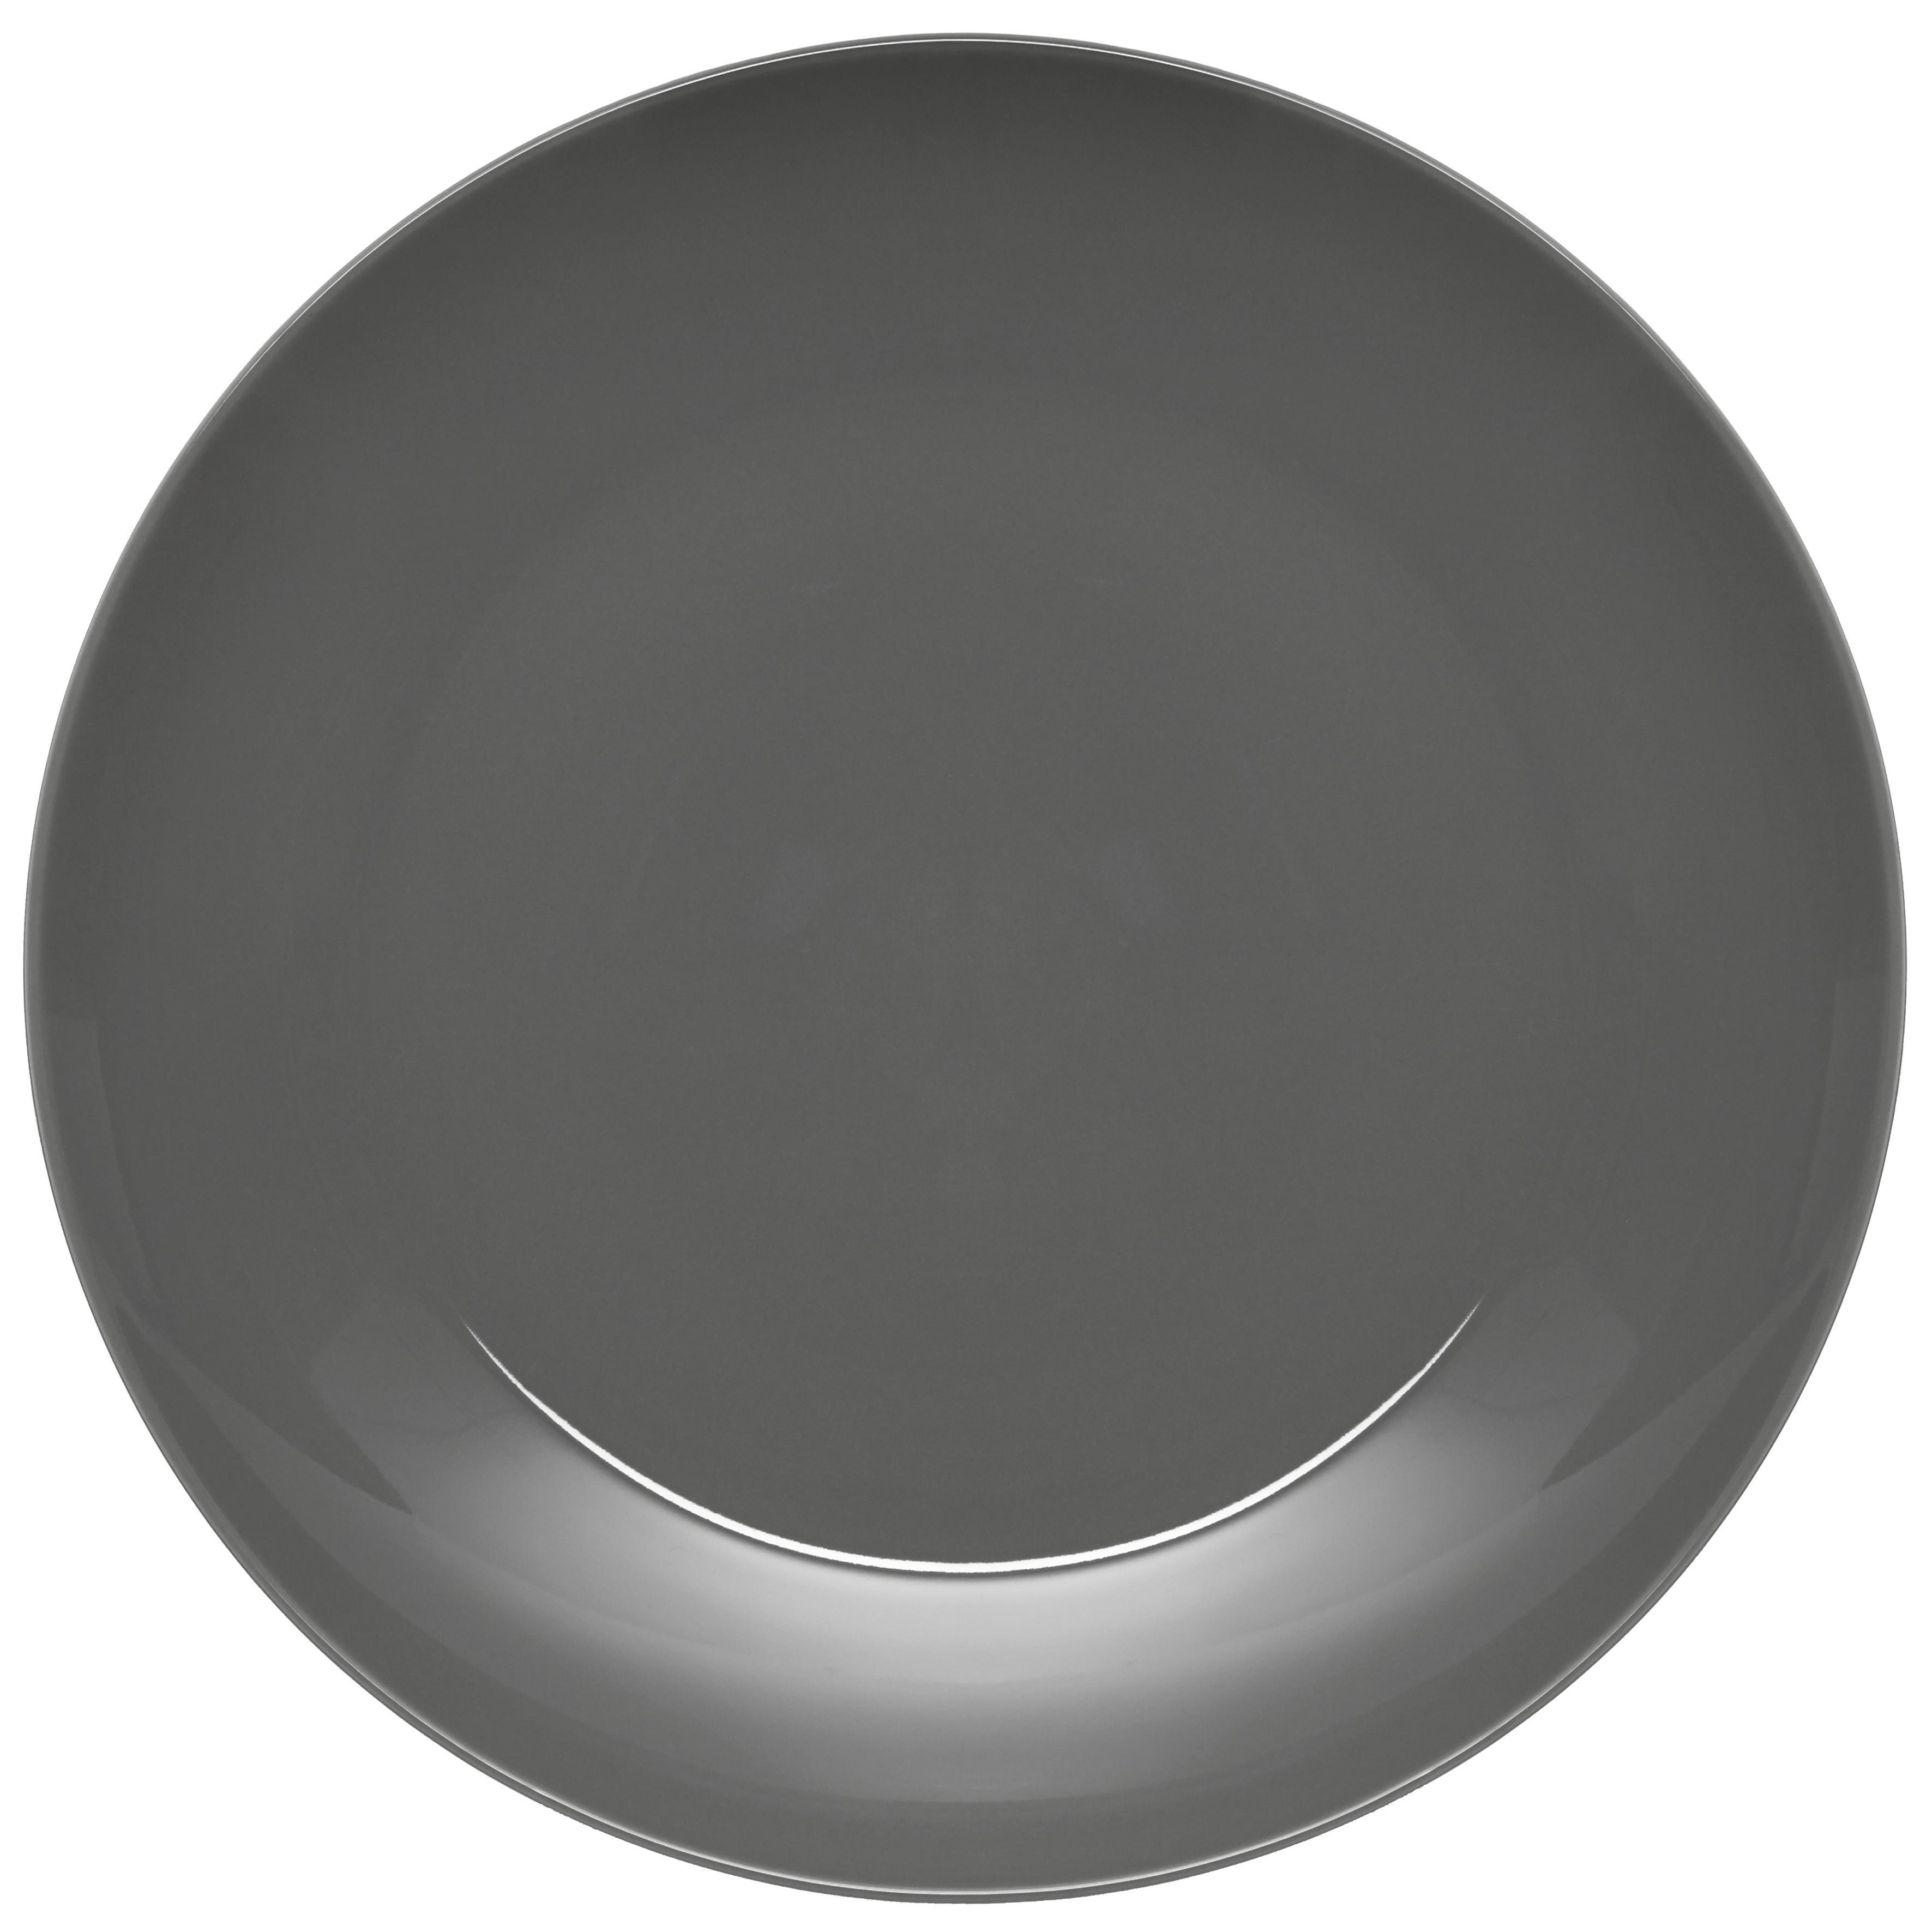 Suppenteller Sandy aus Keramik Ø ca. 20cm